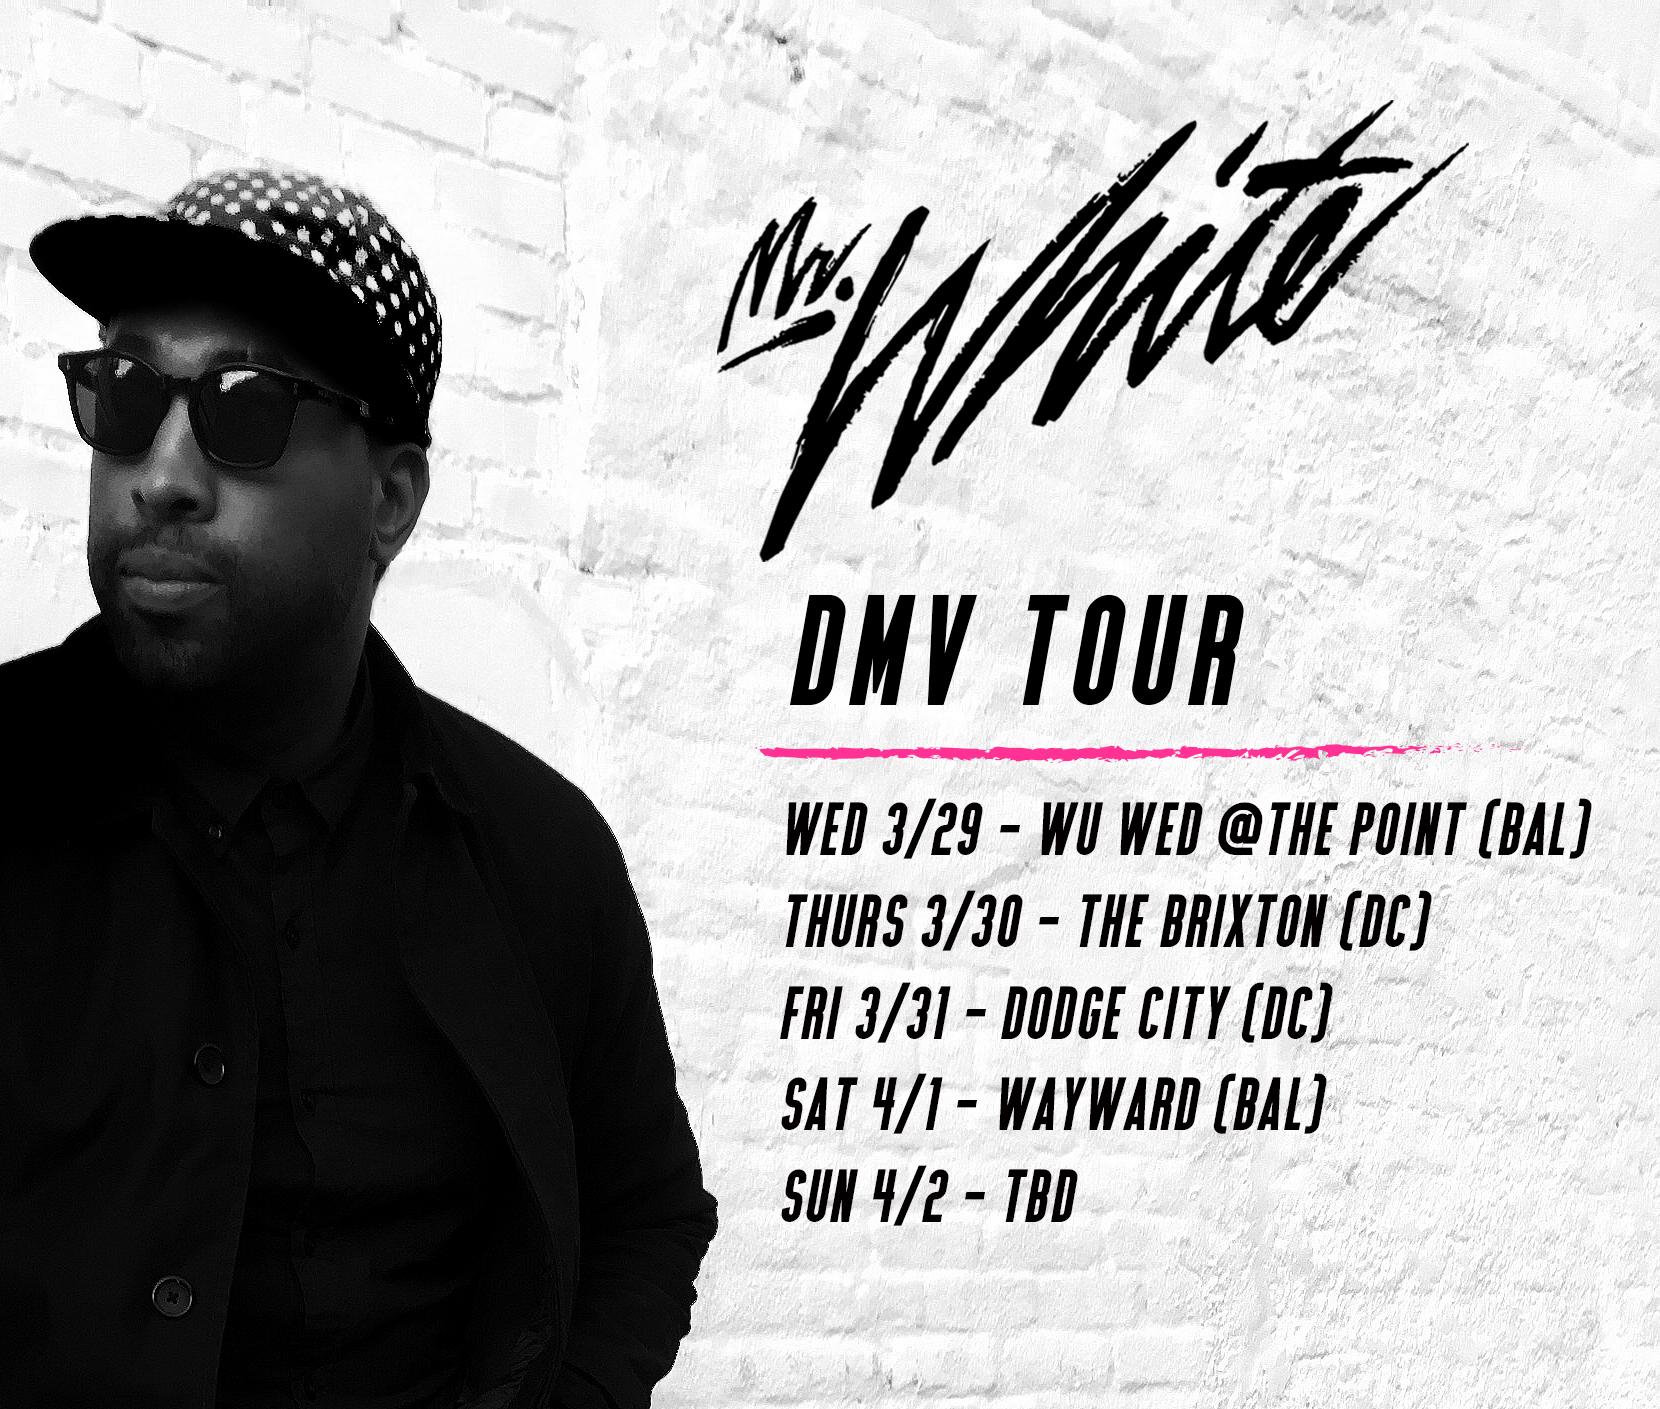 mr white tour 2.jpg